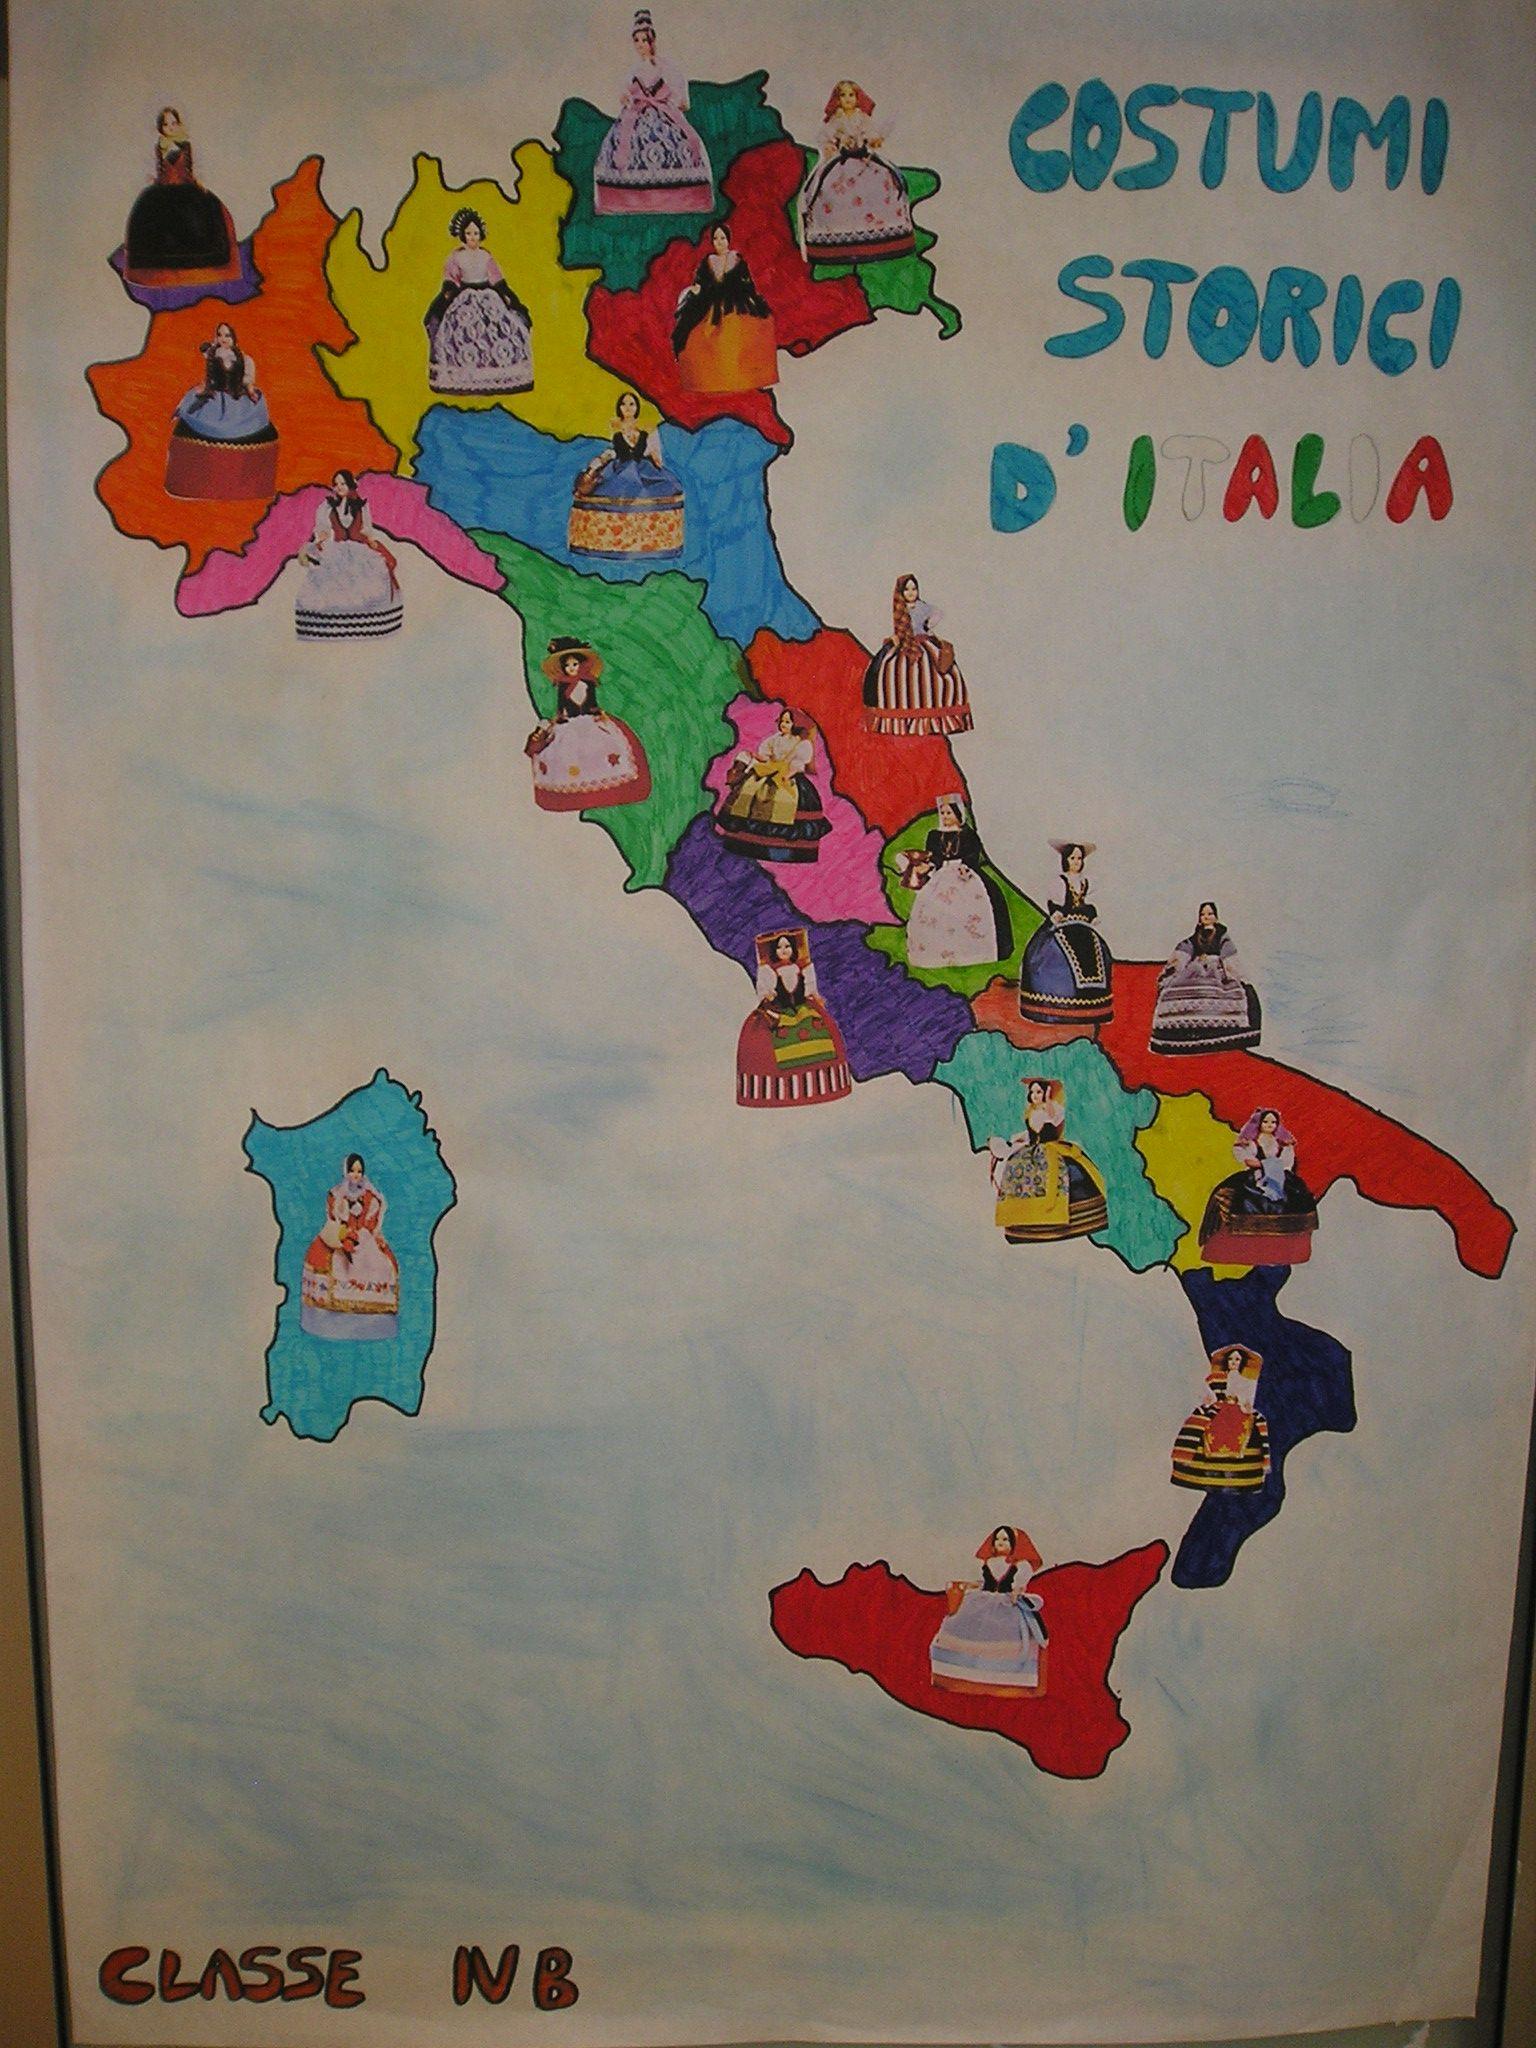 costumi italiani   Fantasia Feste tradizionali Flora e fauna Italia fisica